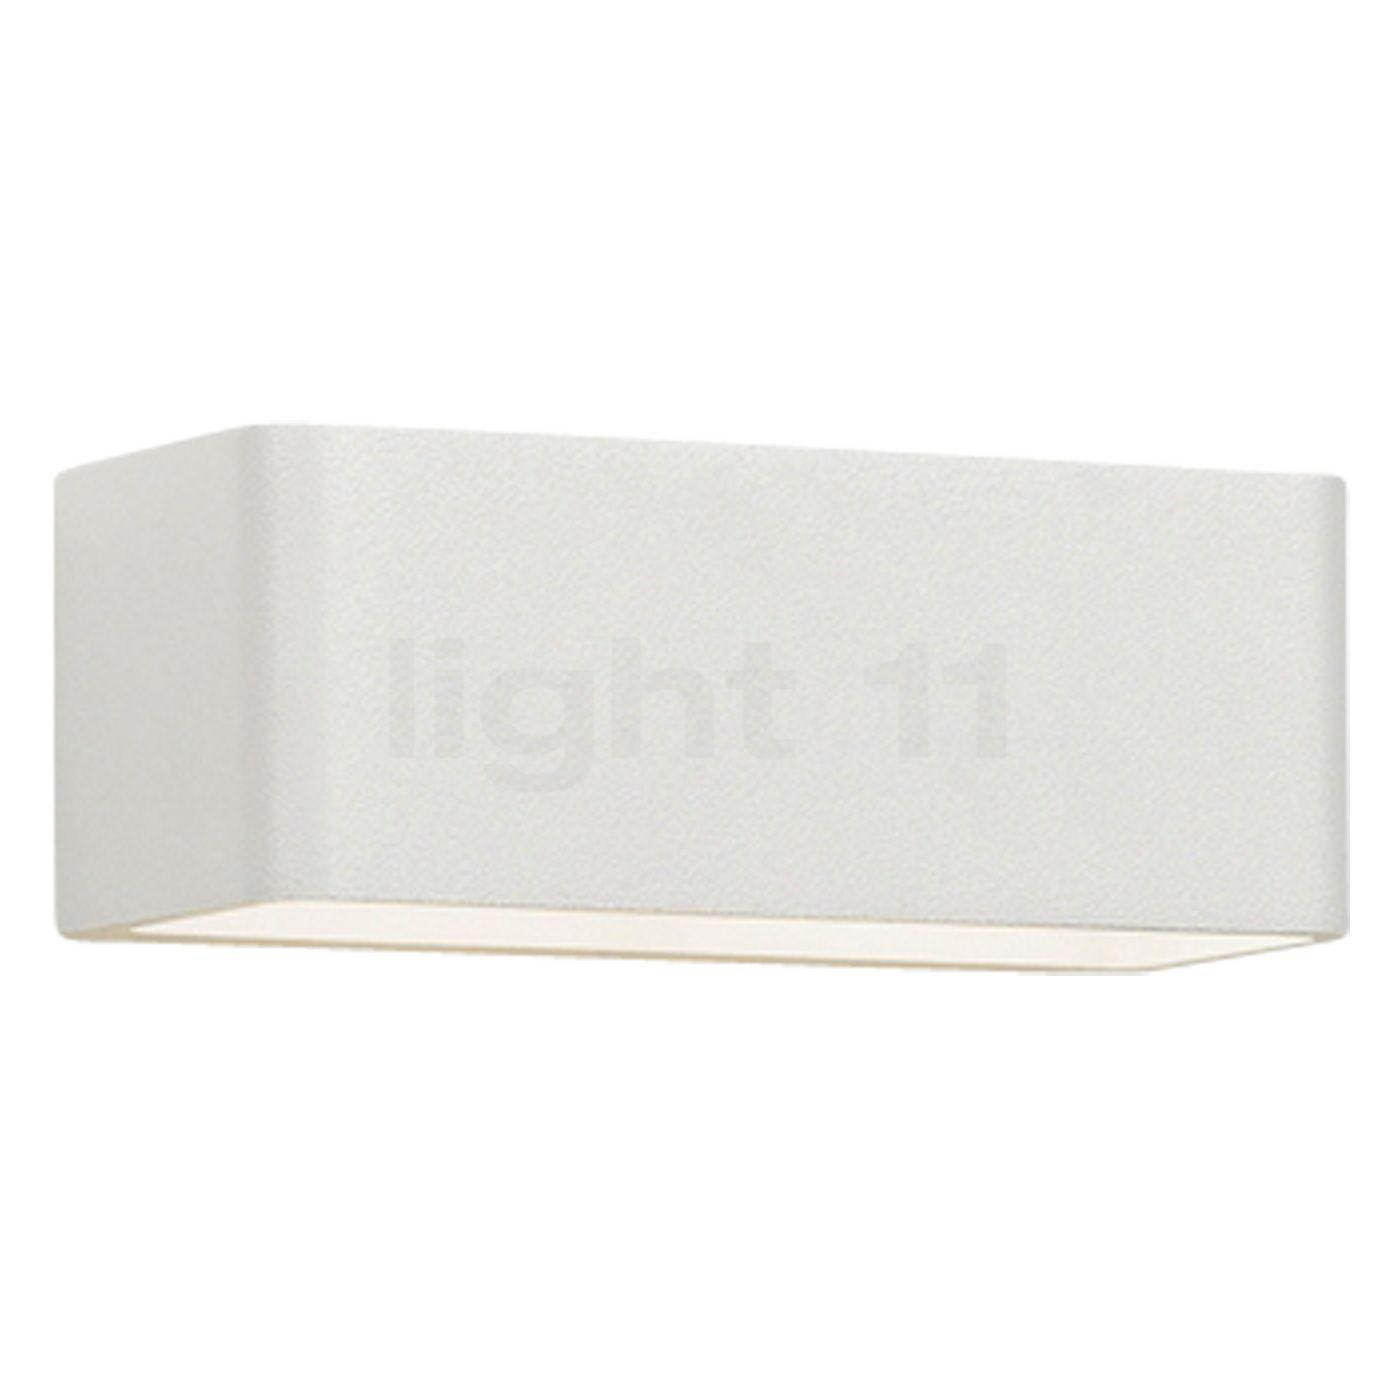 delta light gala led ww wandleuchte kaufen bei. Black Bedroom Furniture Sets. Home Design Ideas